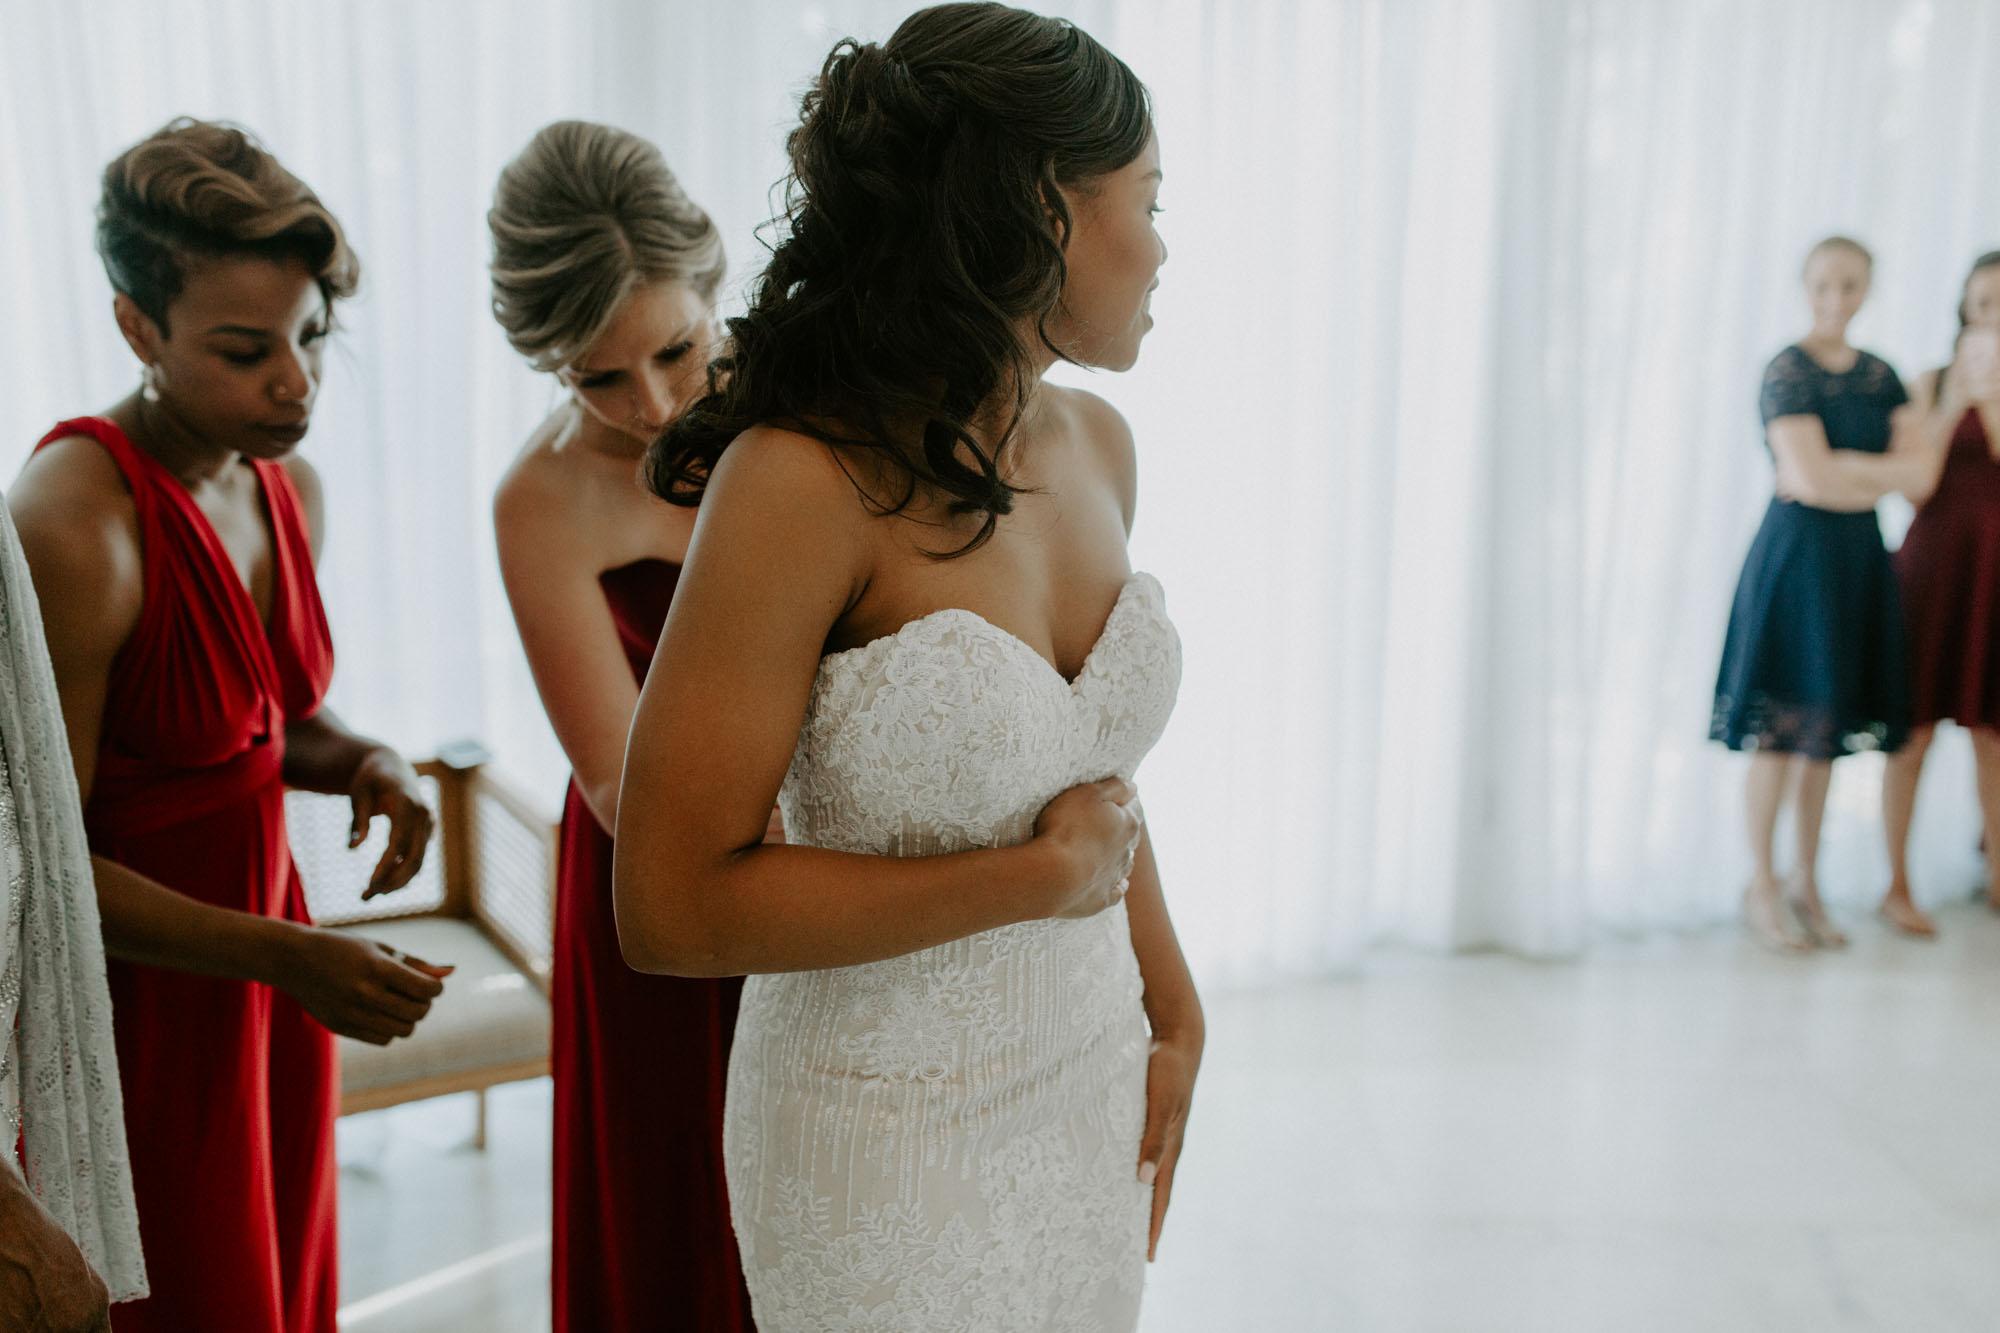 prairie_glass_house_wedding_champaign_wright_photographs_simon_0012.jpg